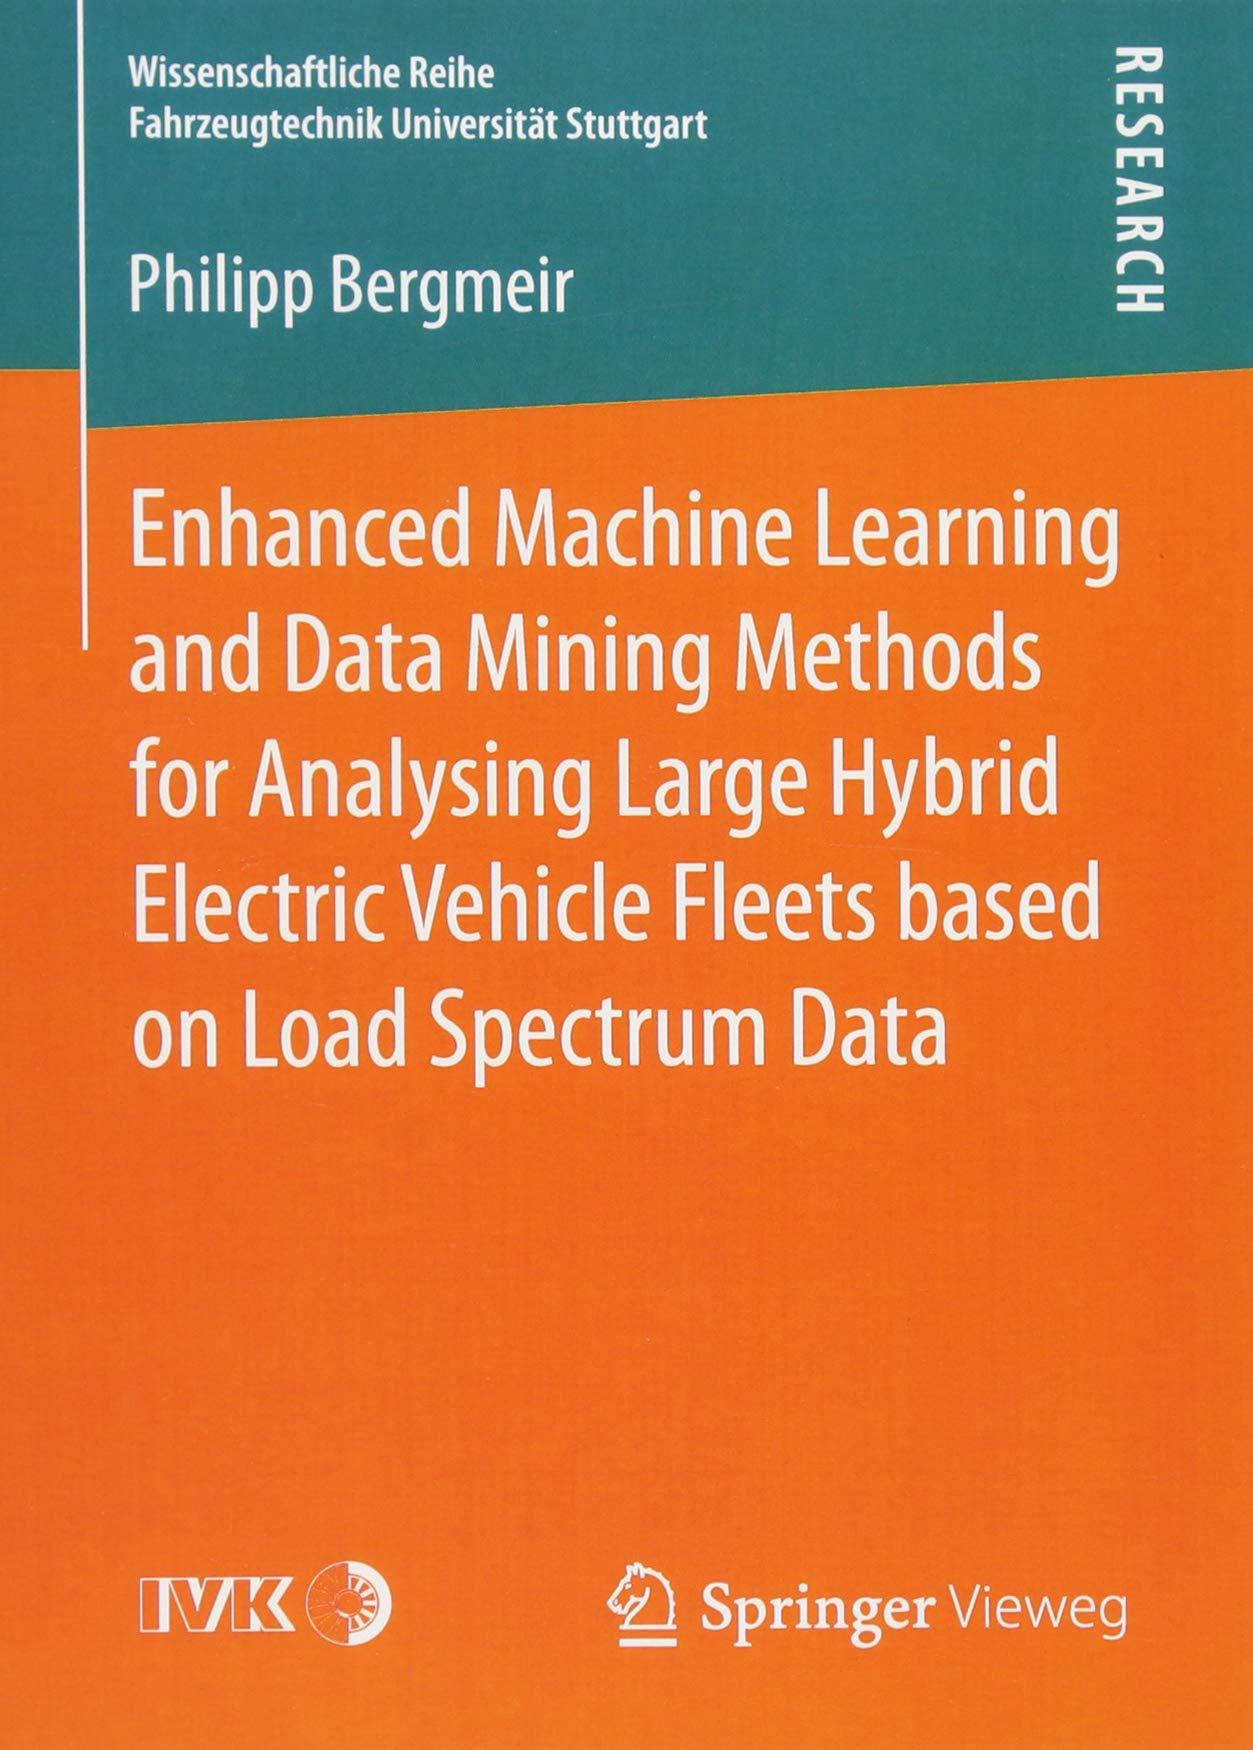 Download Enhanced Machine Learning and Data Mining Methods for Analysing Large Hybrid Electric Vehicle Fleets based on Load Spectrum Data (Wissenschaftliche Reihe Fahrzeugtechnik Universität Stuttgart) pdf